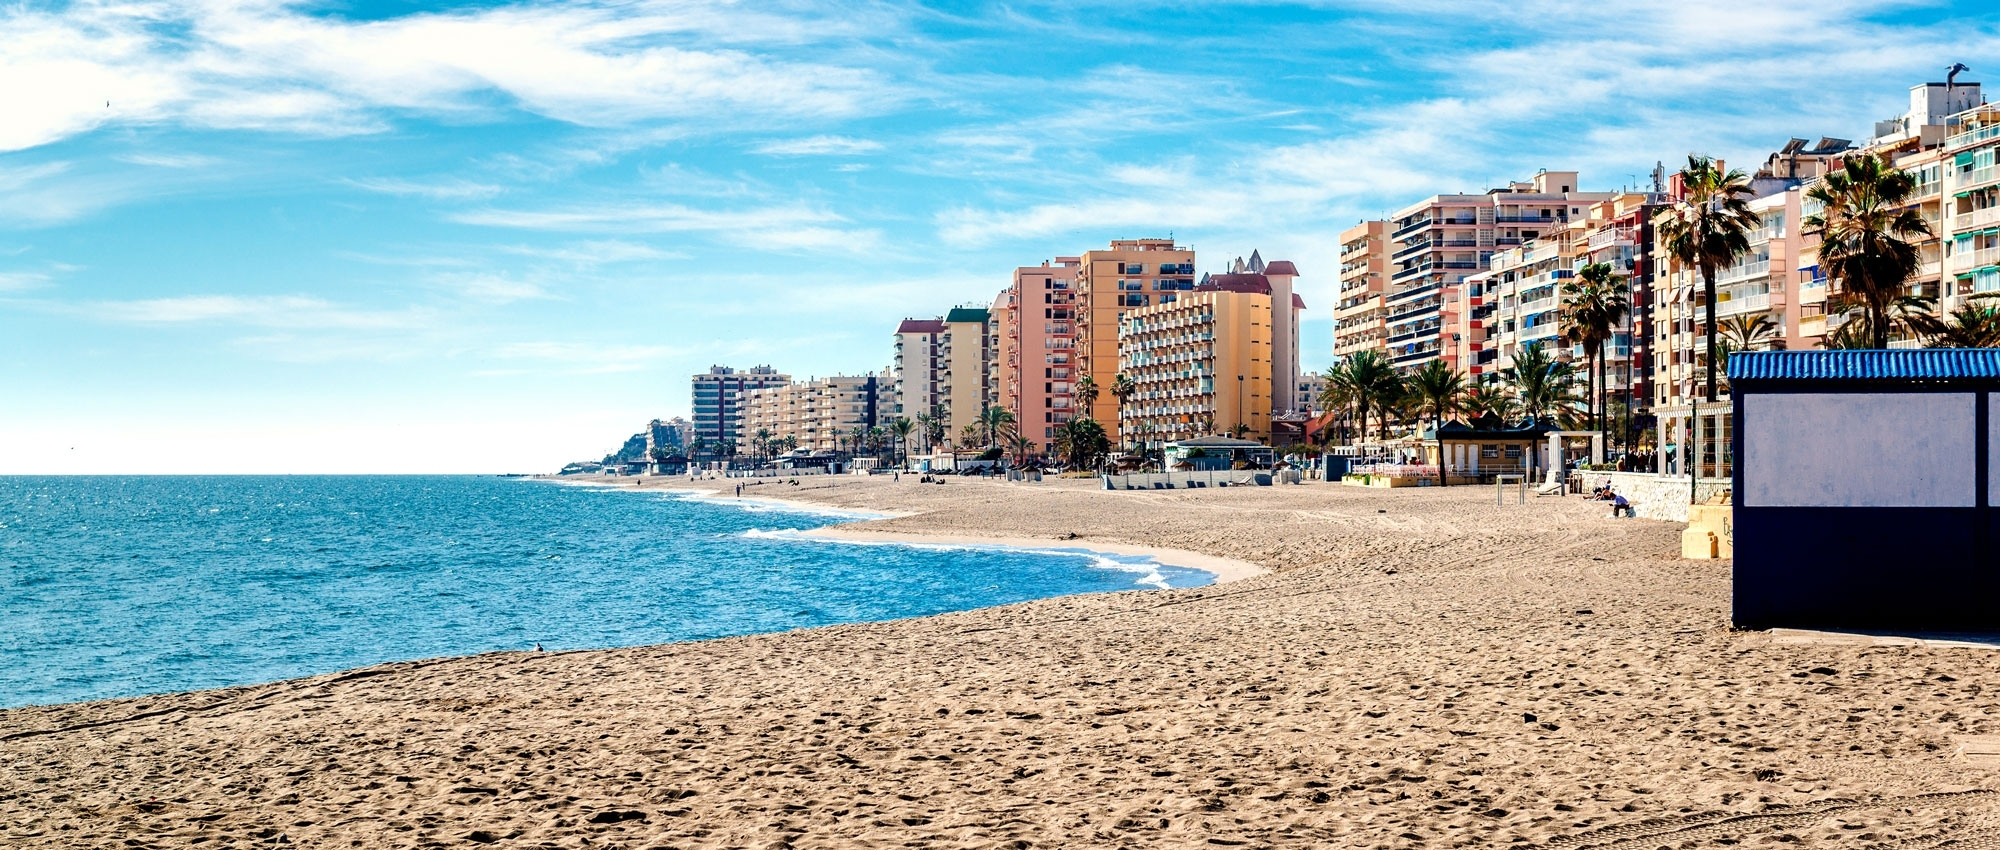 Rent a Convertible in Fuengirola